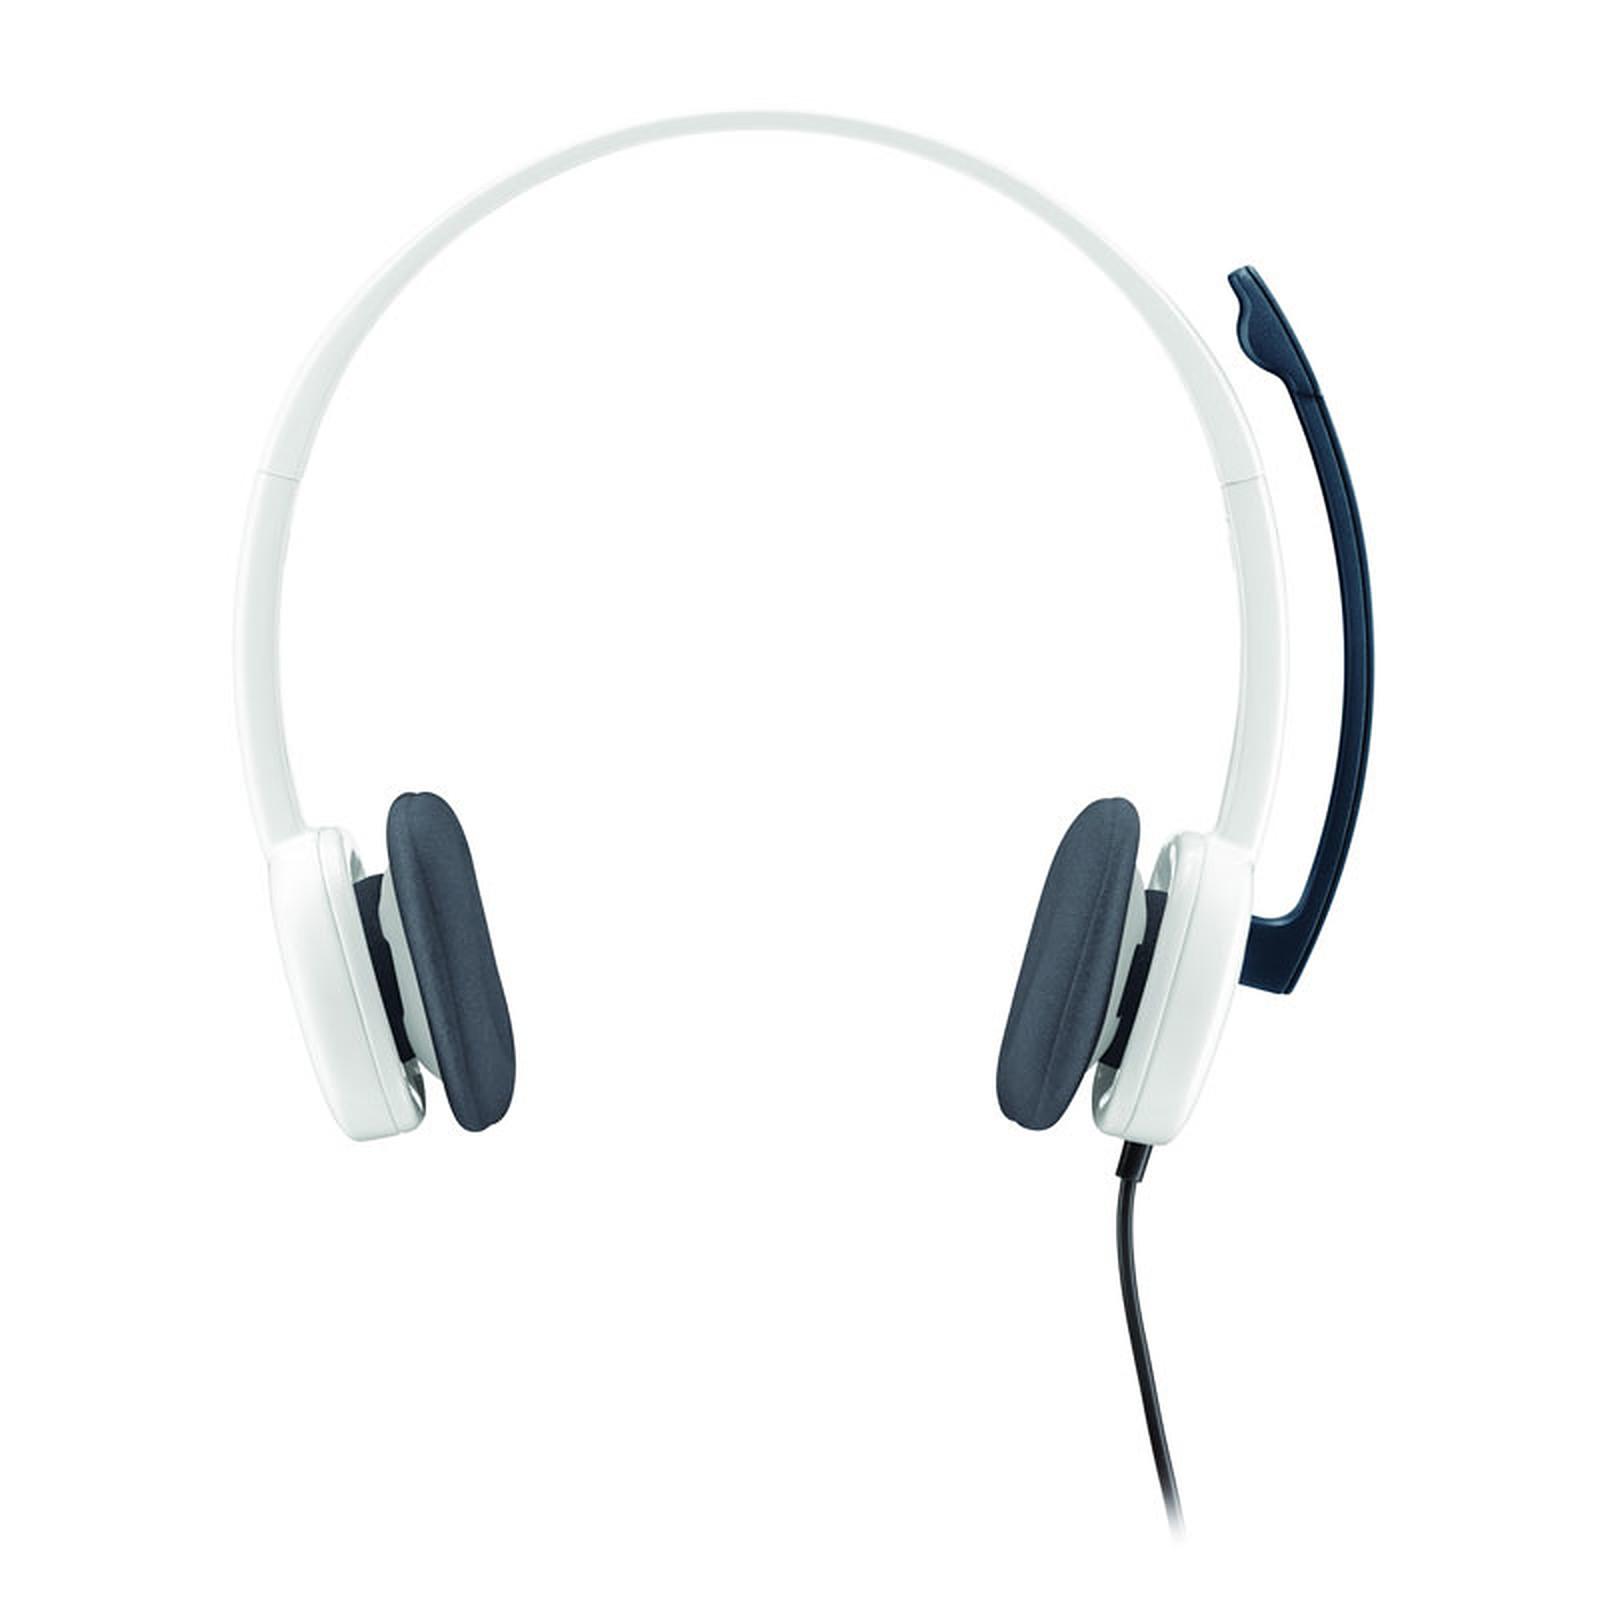 Logitech Stereo Headset H150 (Coconut)